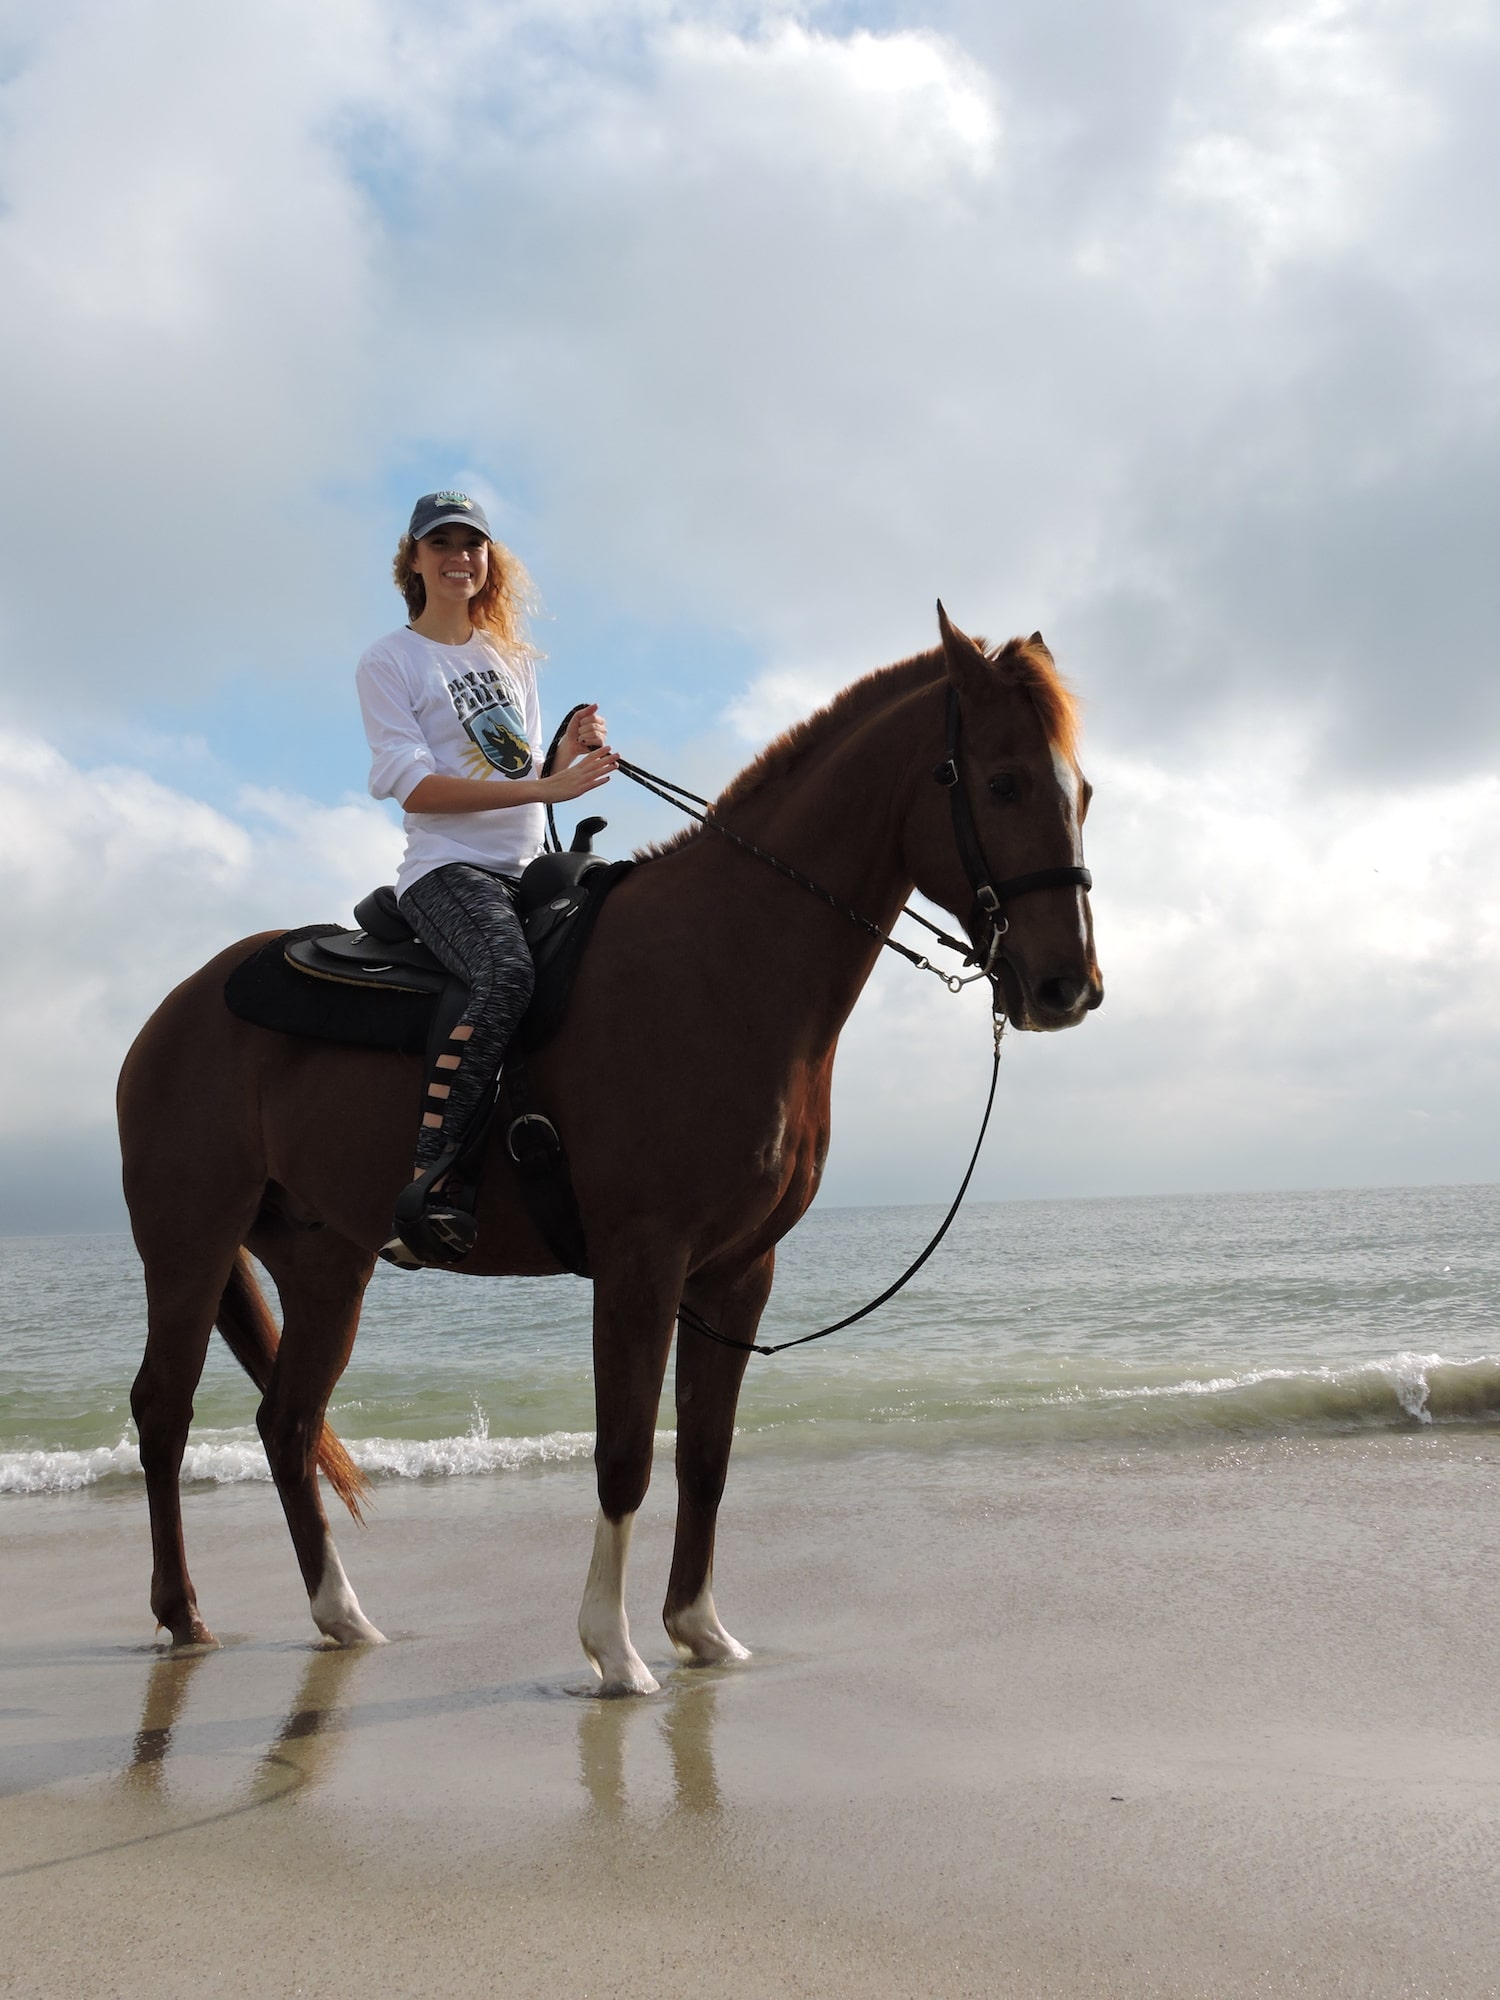 Horseback Riding in Florida